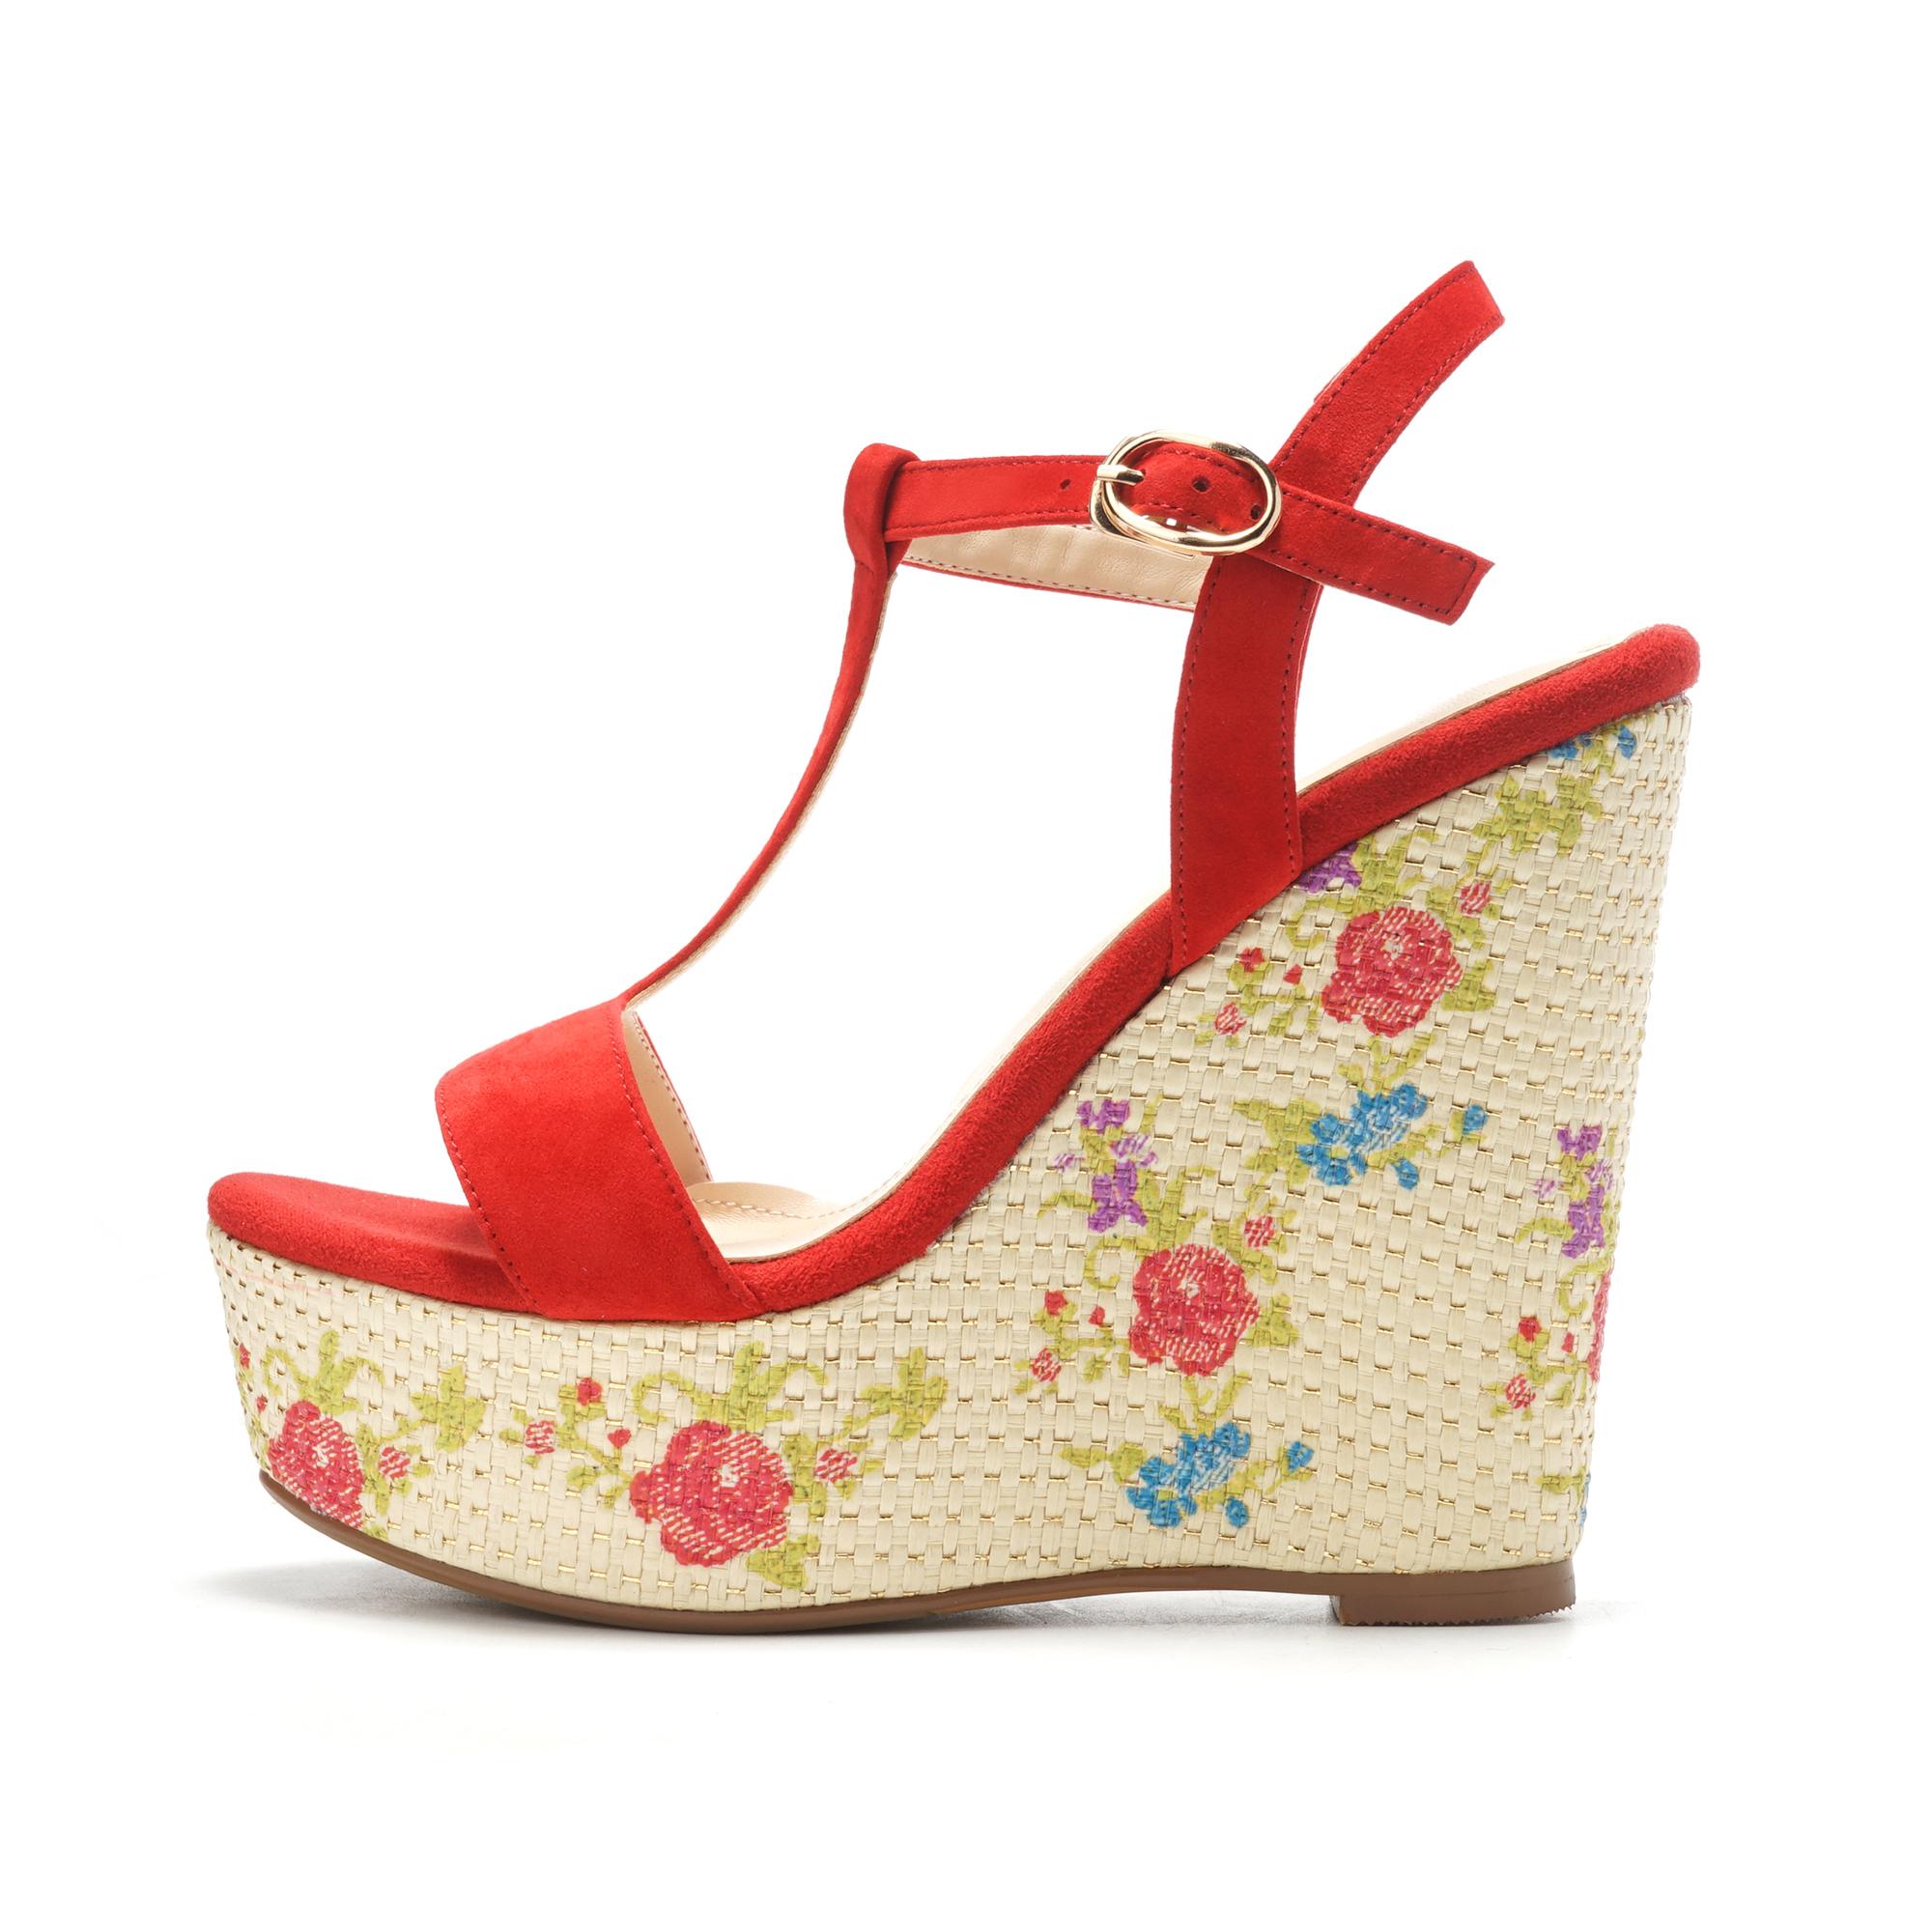 55ff9ae7a58b2 US  49 - Arden Furtado 2018 summer new high heels wedges platform T-strap  peep toe fashion flowers sandals shoes for woman genuine suede -  www.ardenfurtado. ...